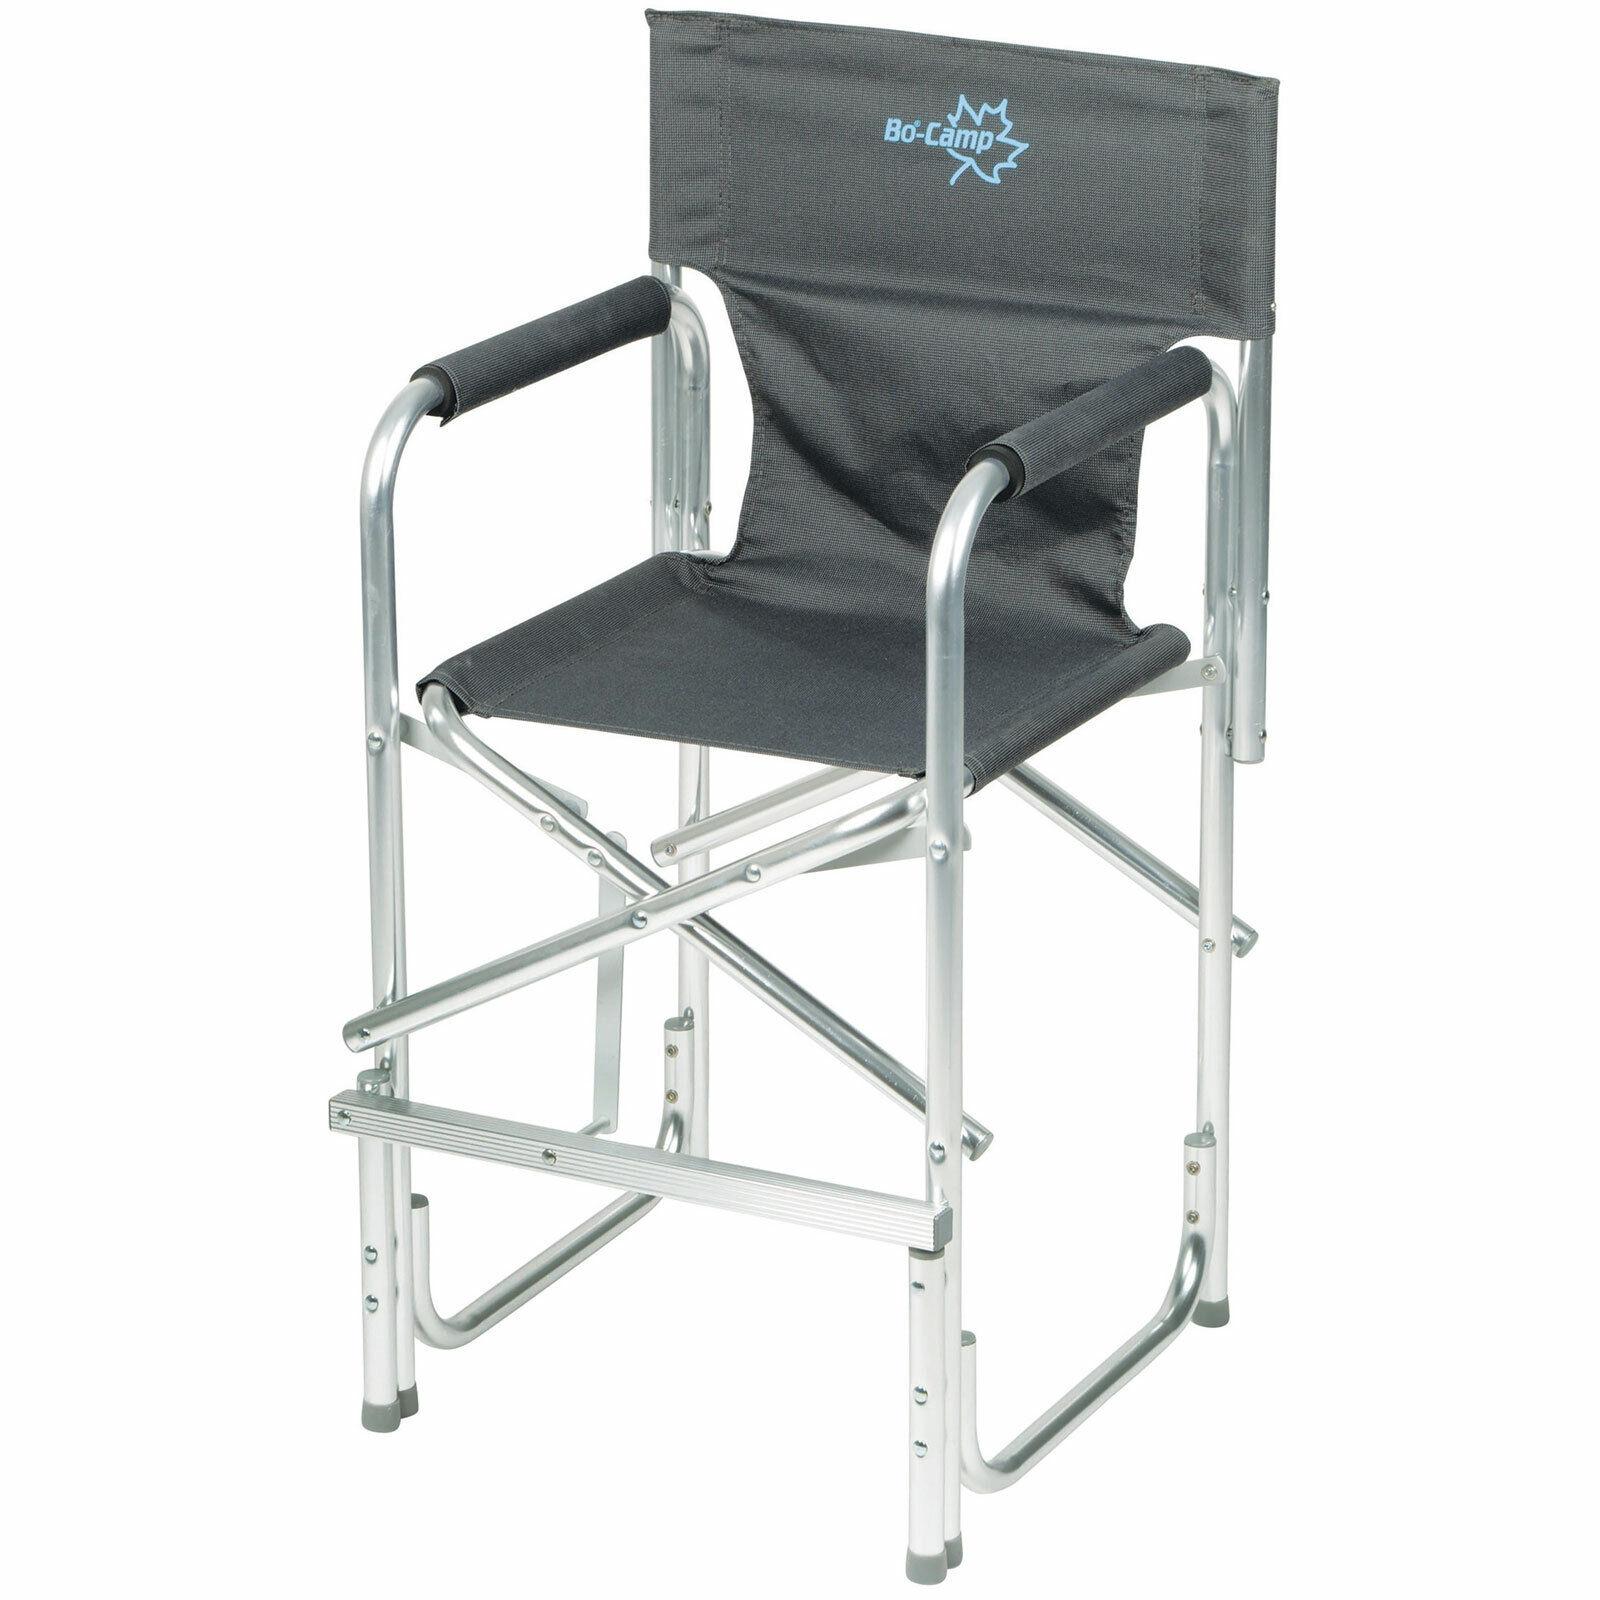 Camping Stuhl Aluminium Campingstuhl Kinder Klappstuhl Kinderstuhl Faltstuhl BW